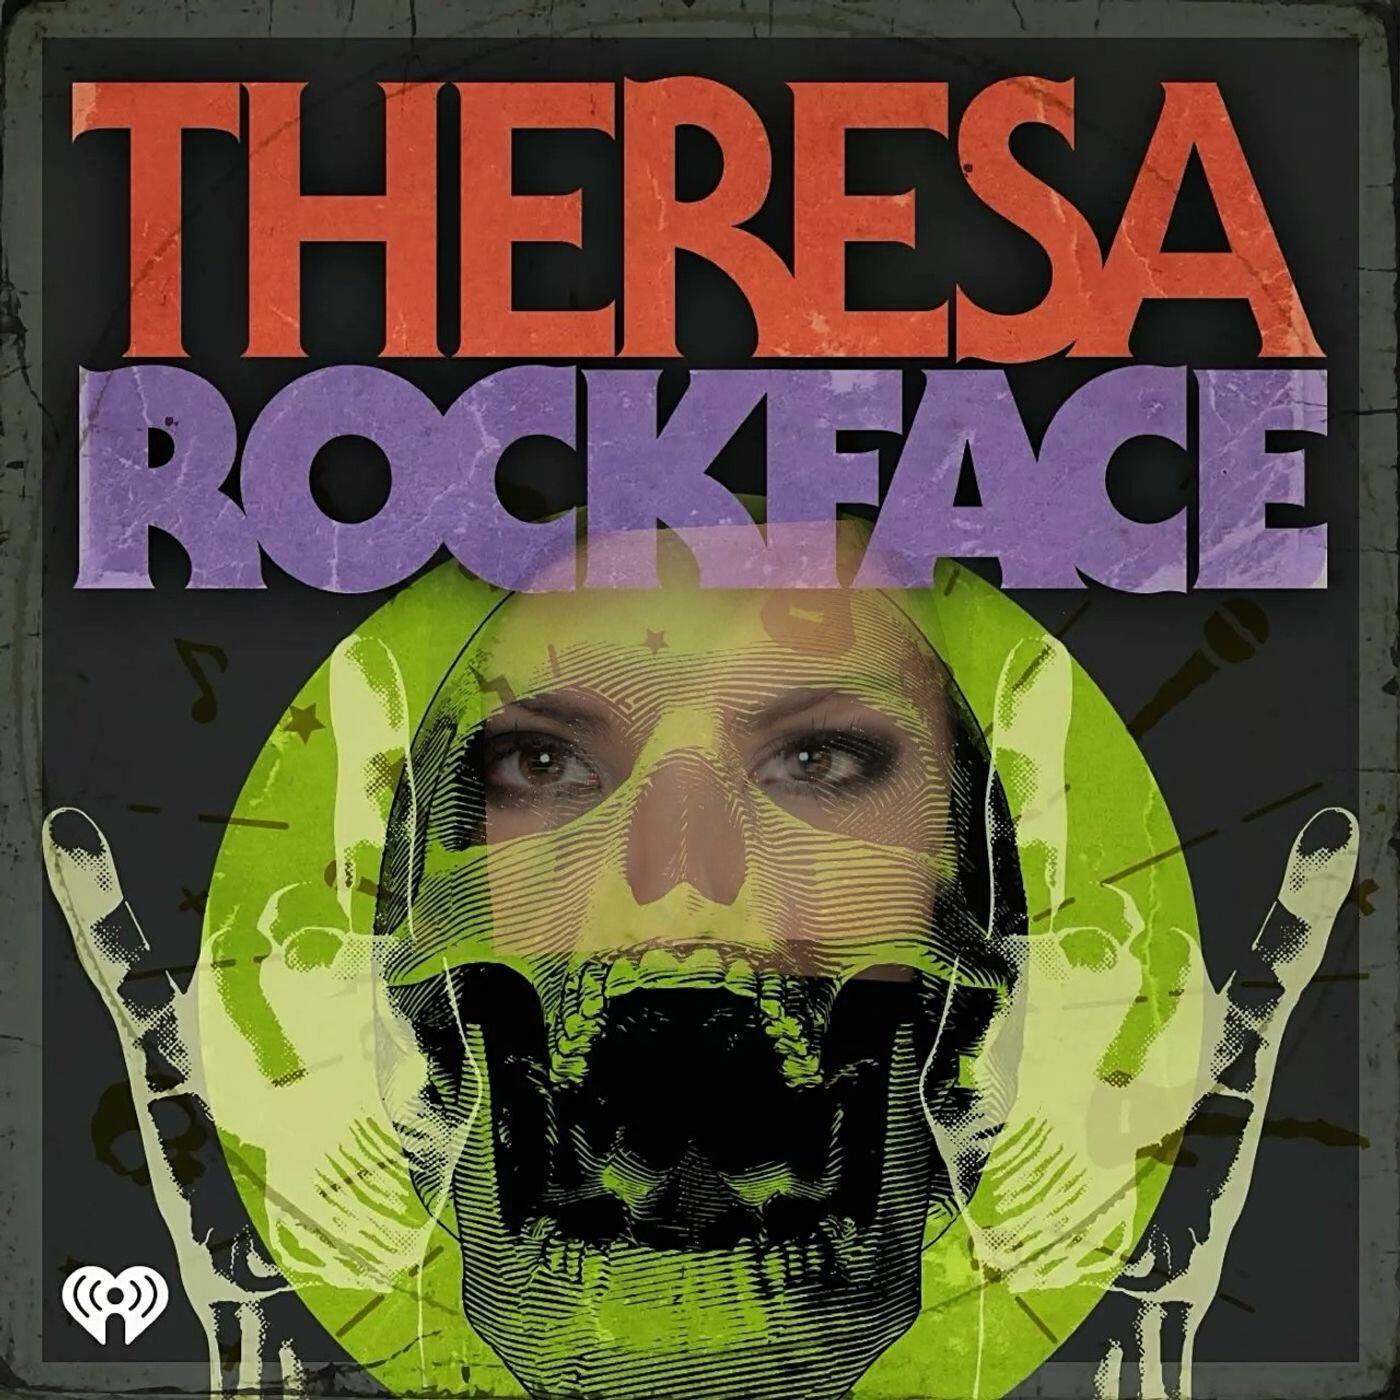 TheresaRockface